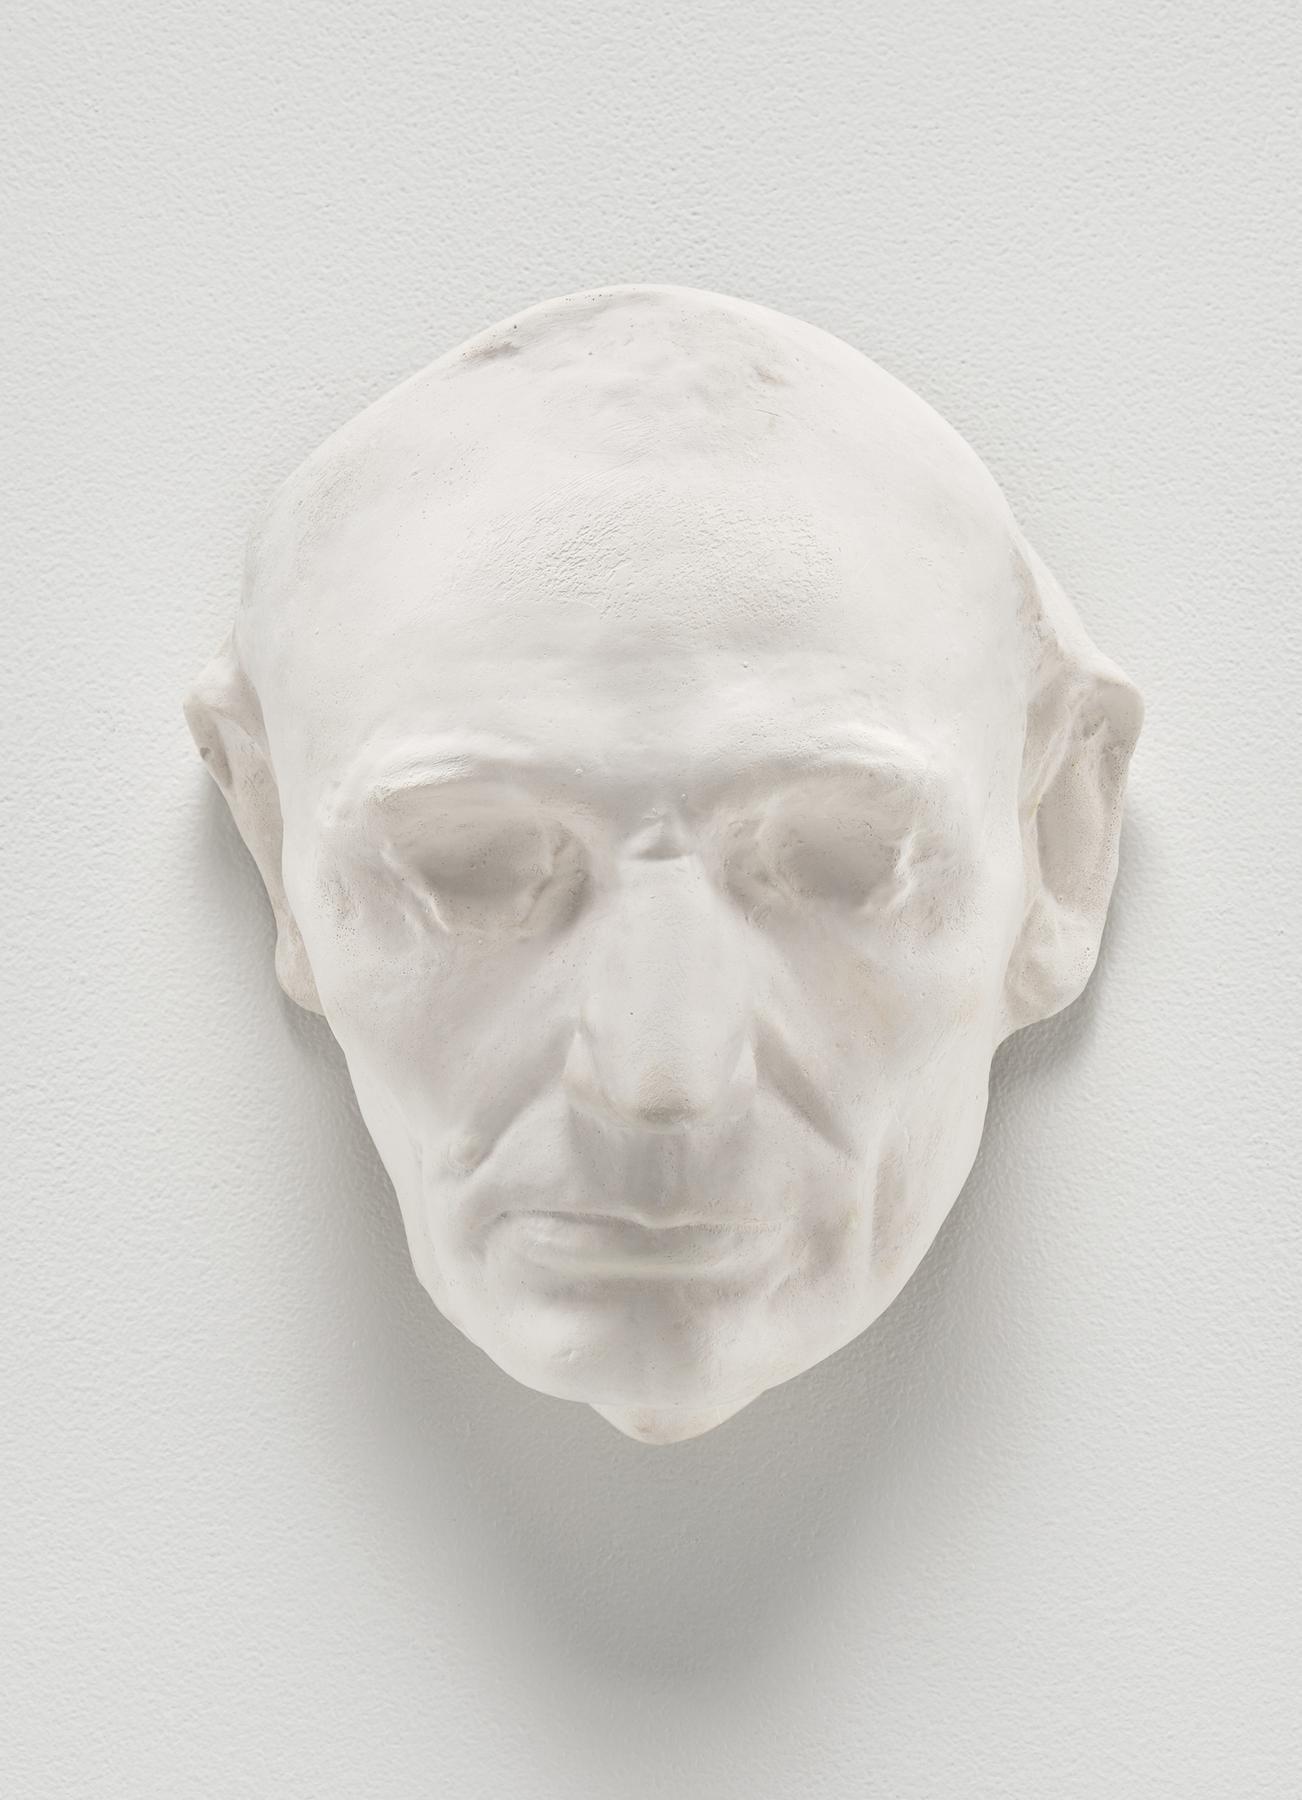 Edmier imagines (Abraham Lincoln (1860), President)